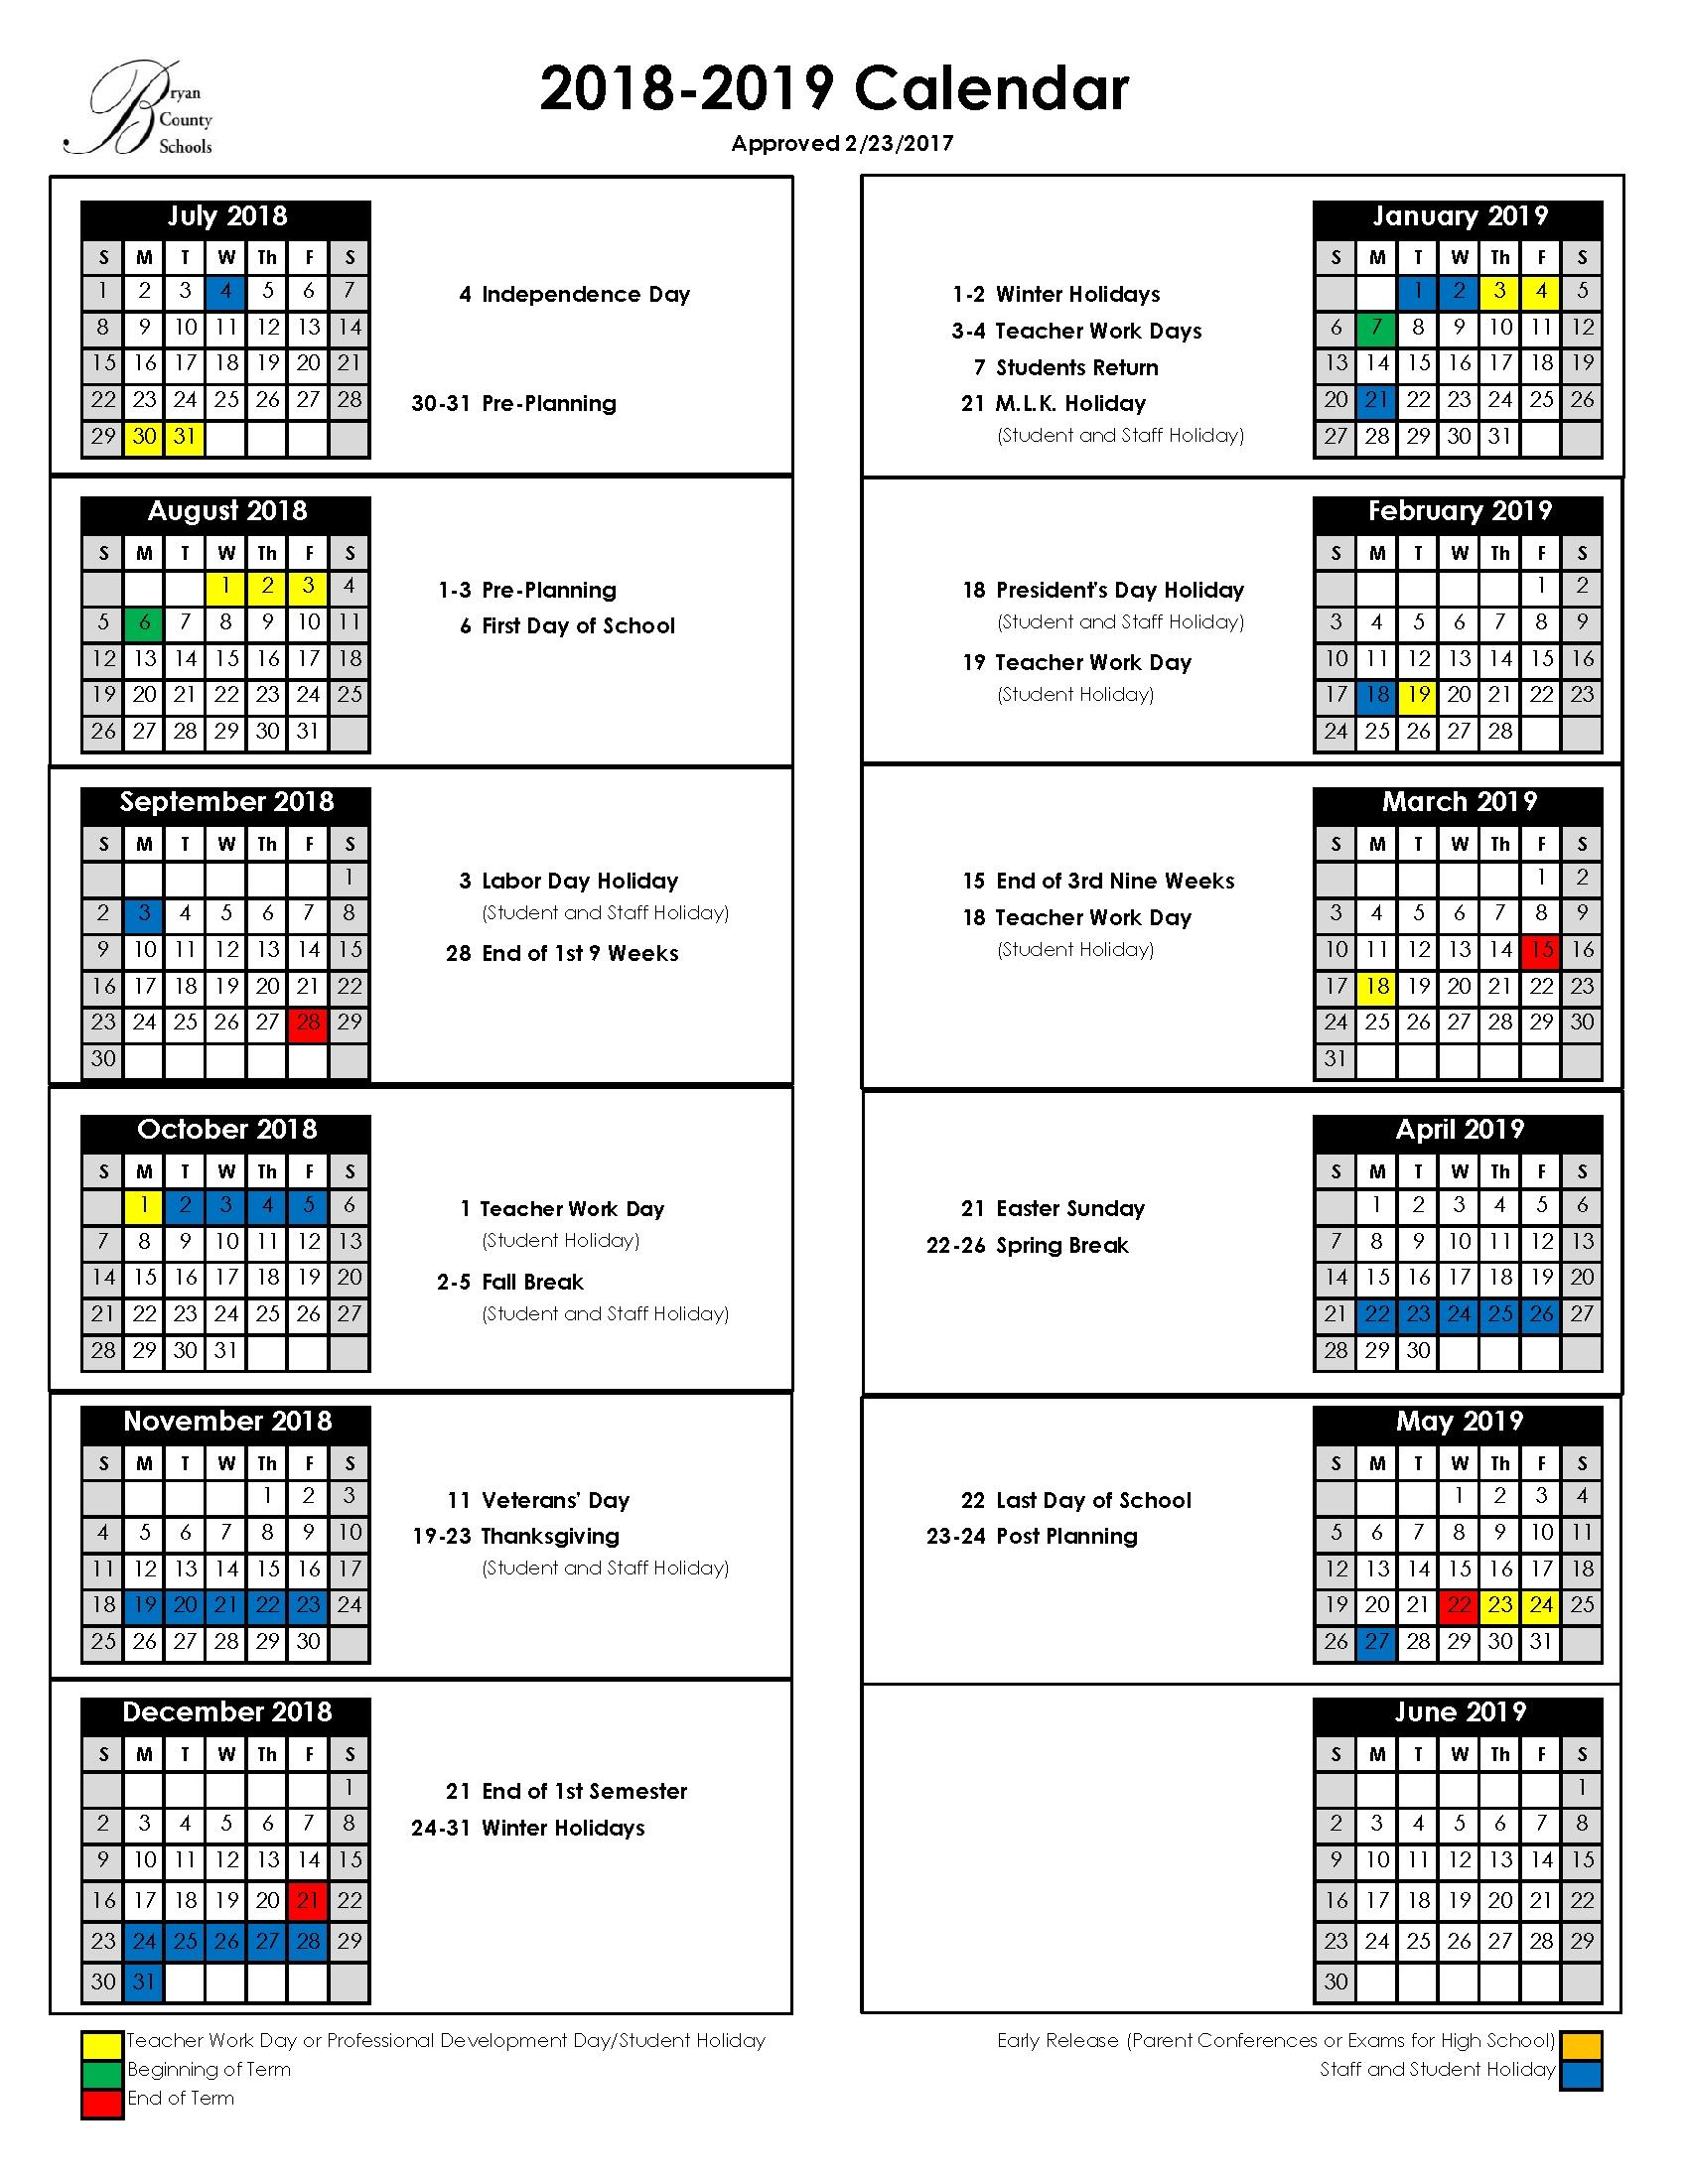 Bryan County Schools Calendar 2019 19